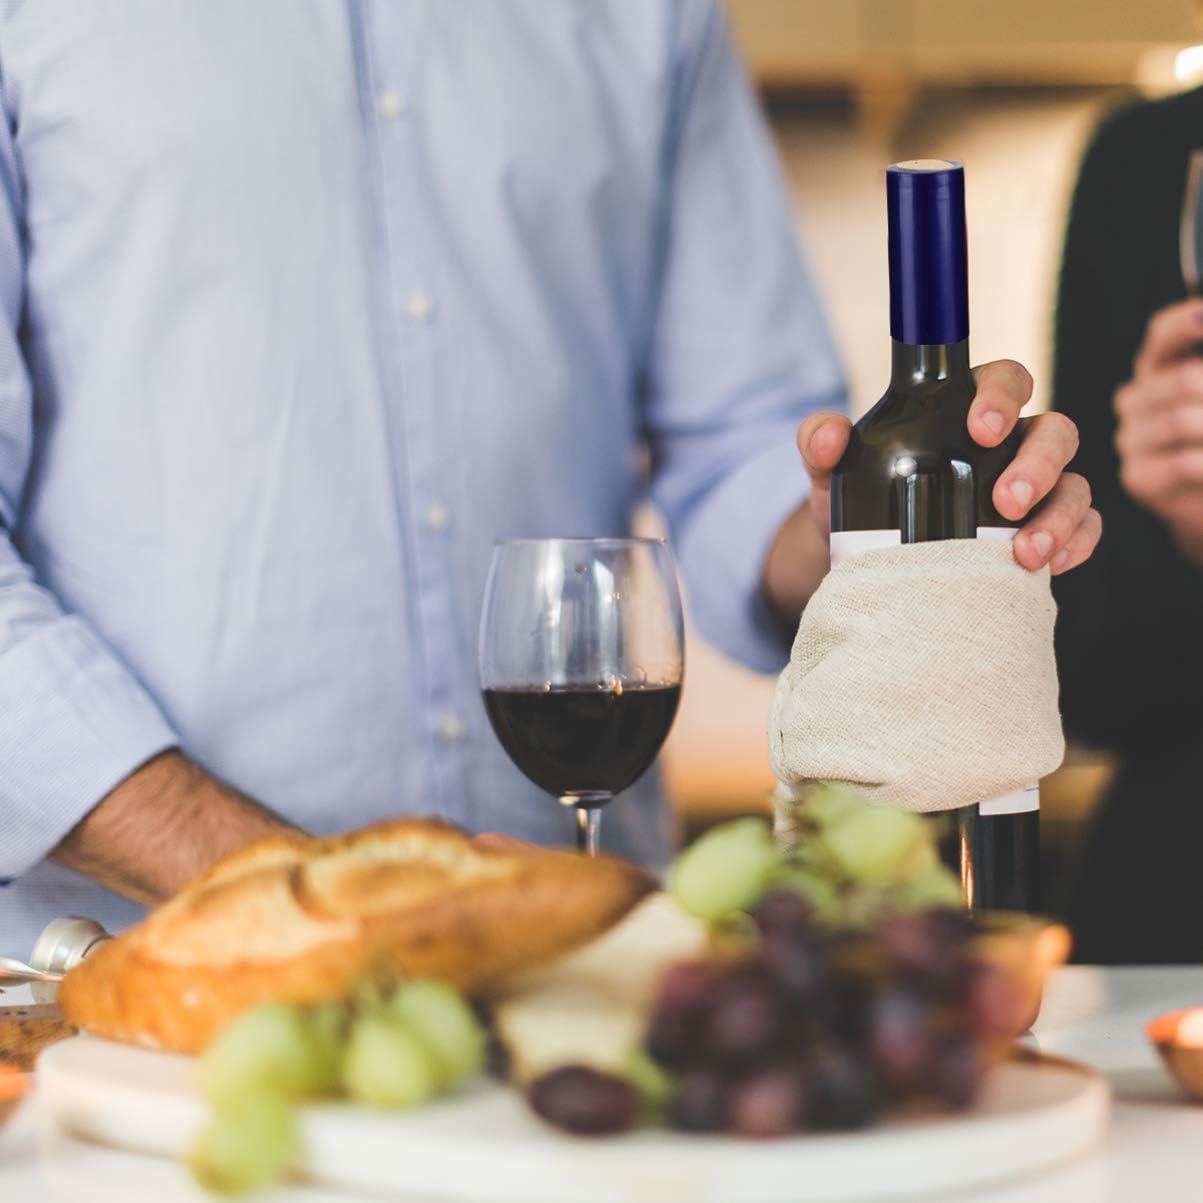 Blue Hemoton 100pcs PVC Heat Shrink Capsules Wine Bottle Capsules Wine Shrink Wrap Suitable for Wine Bottles 30mm